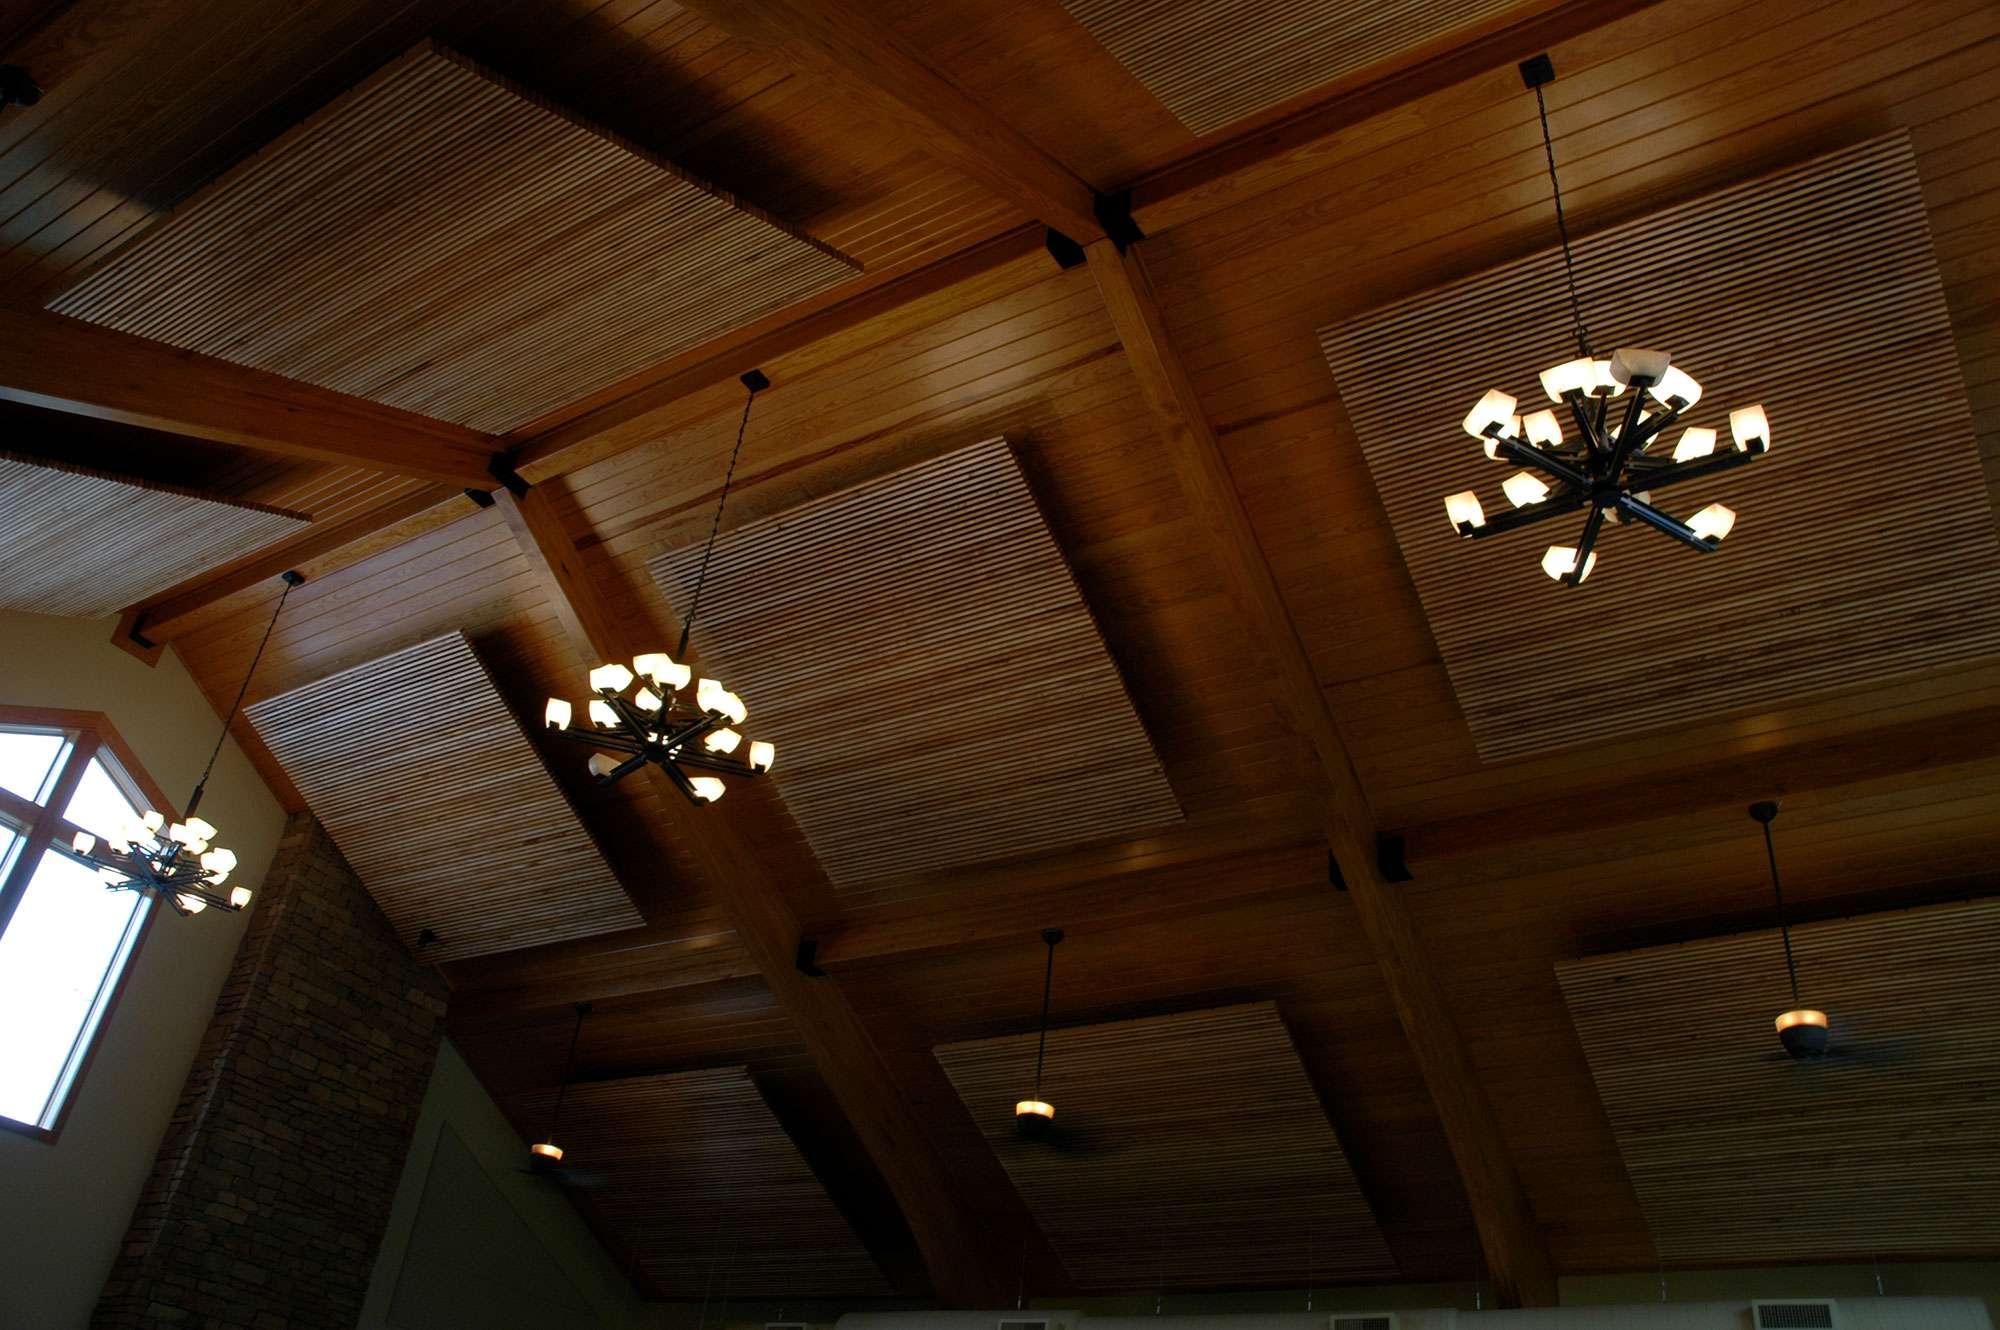 Tabernacle ceiling